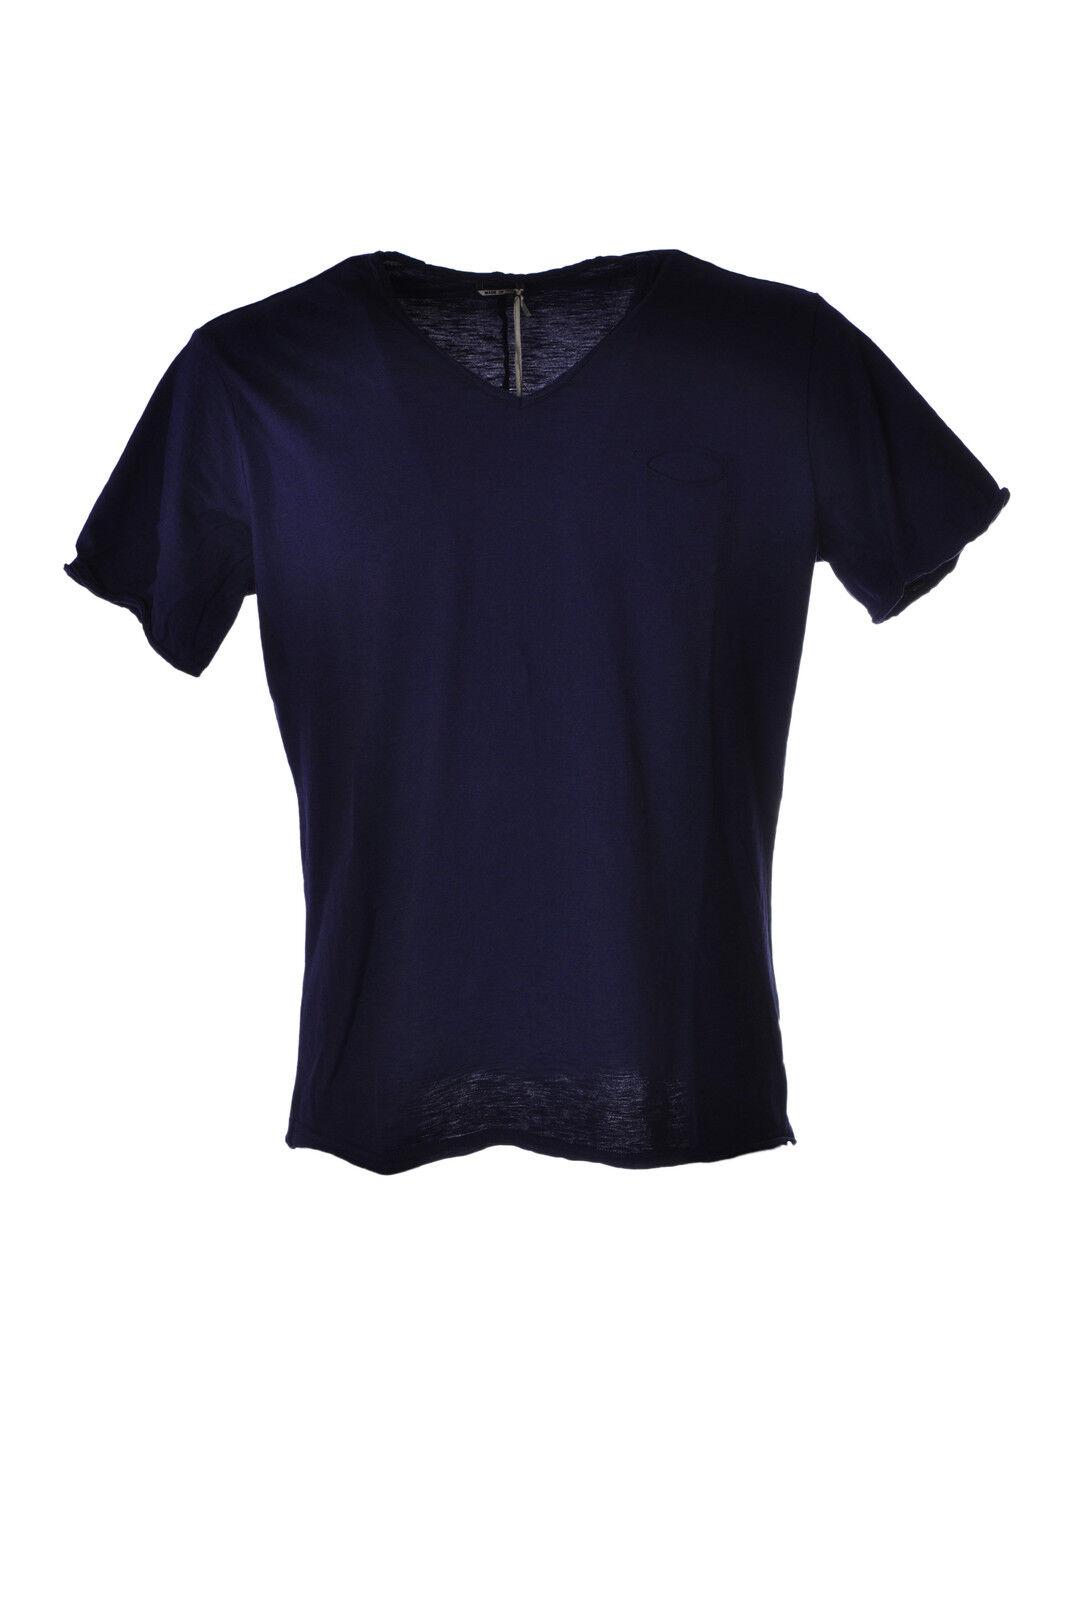 Daniele Alessandrini - Topwear-T-shirts - Man - bluee - 3125615G183929